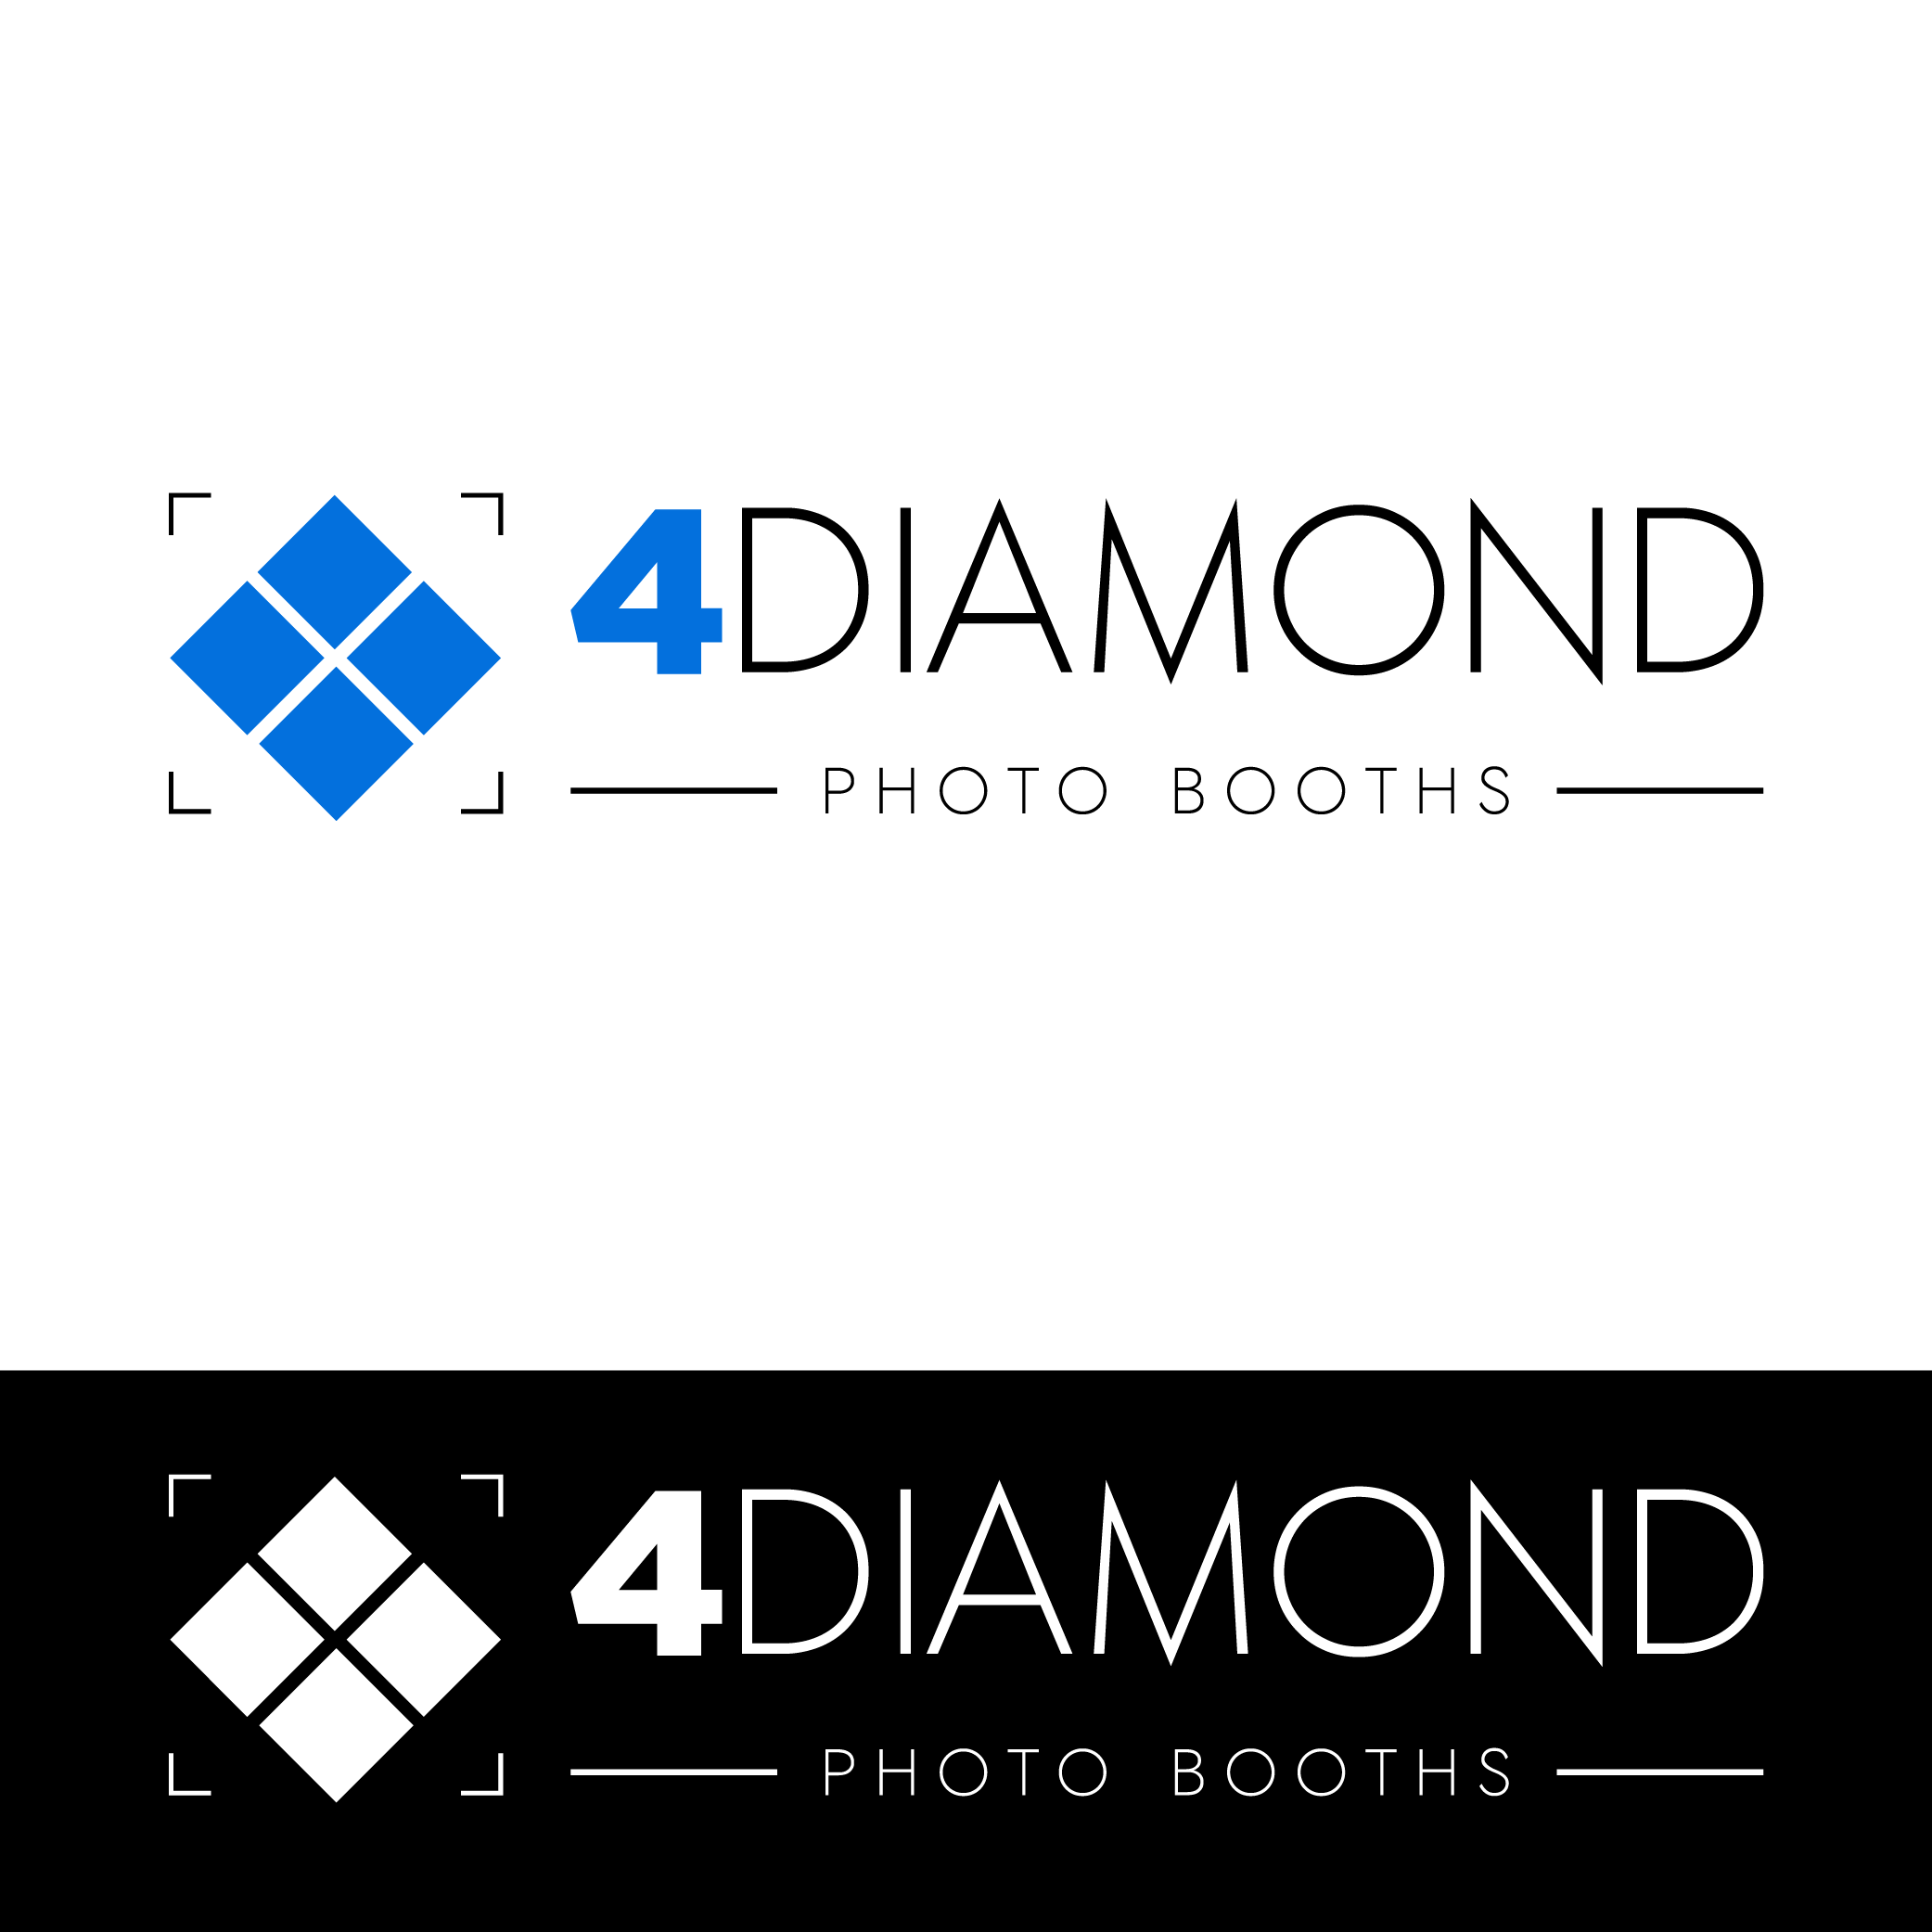 Logo Design by Private User - Entry No. 2 in the Logo Design Contest Creative Logo Design for 4 Diamond Photo Booths.